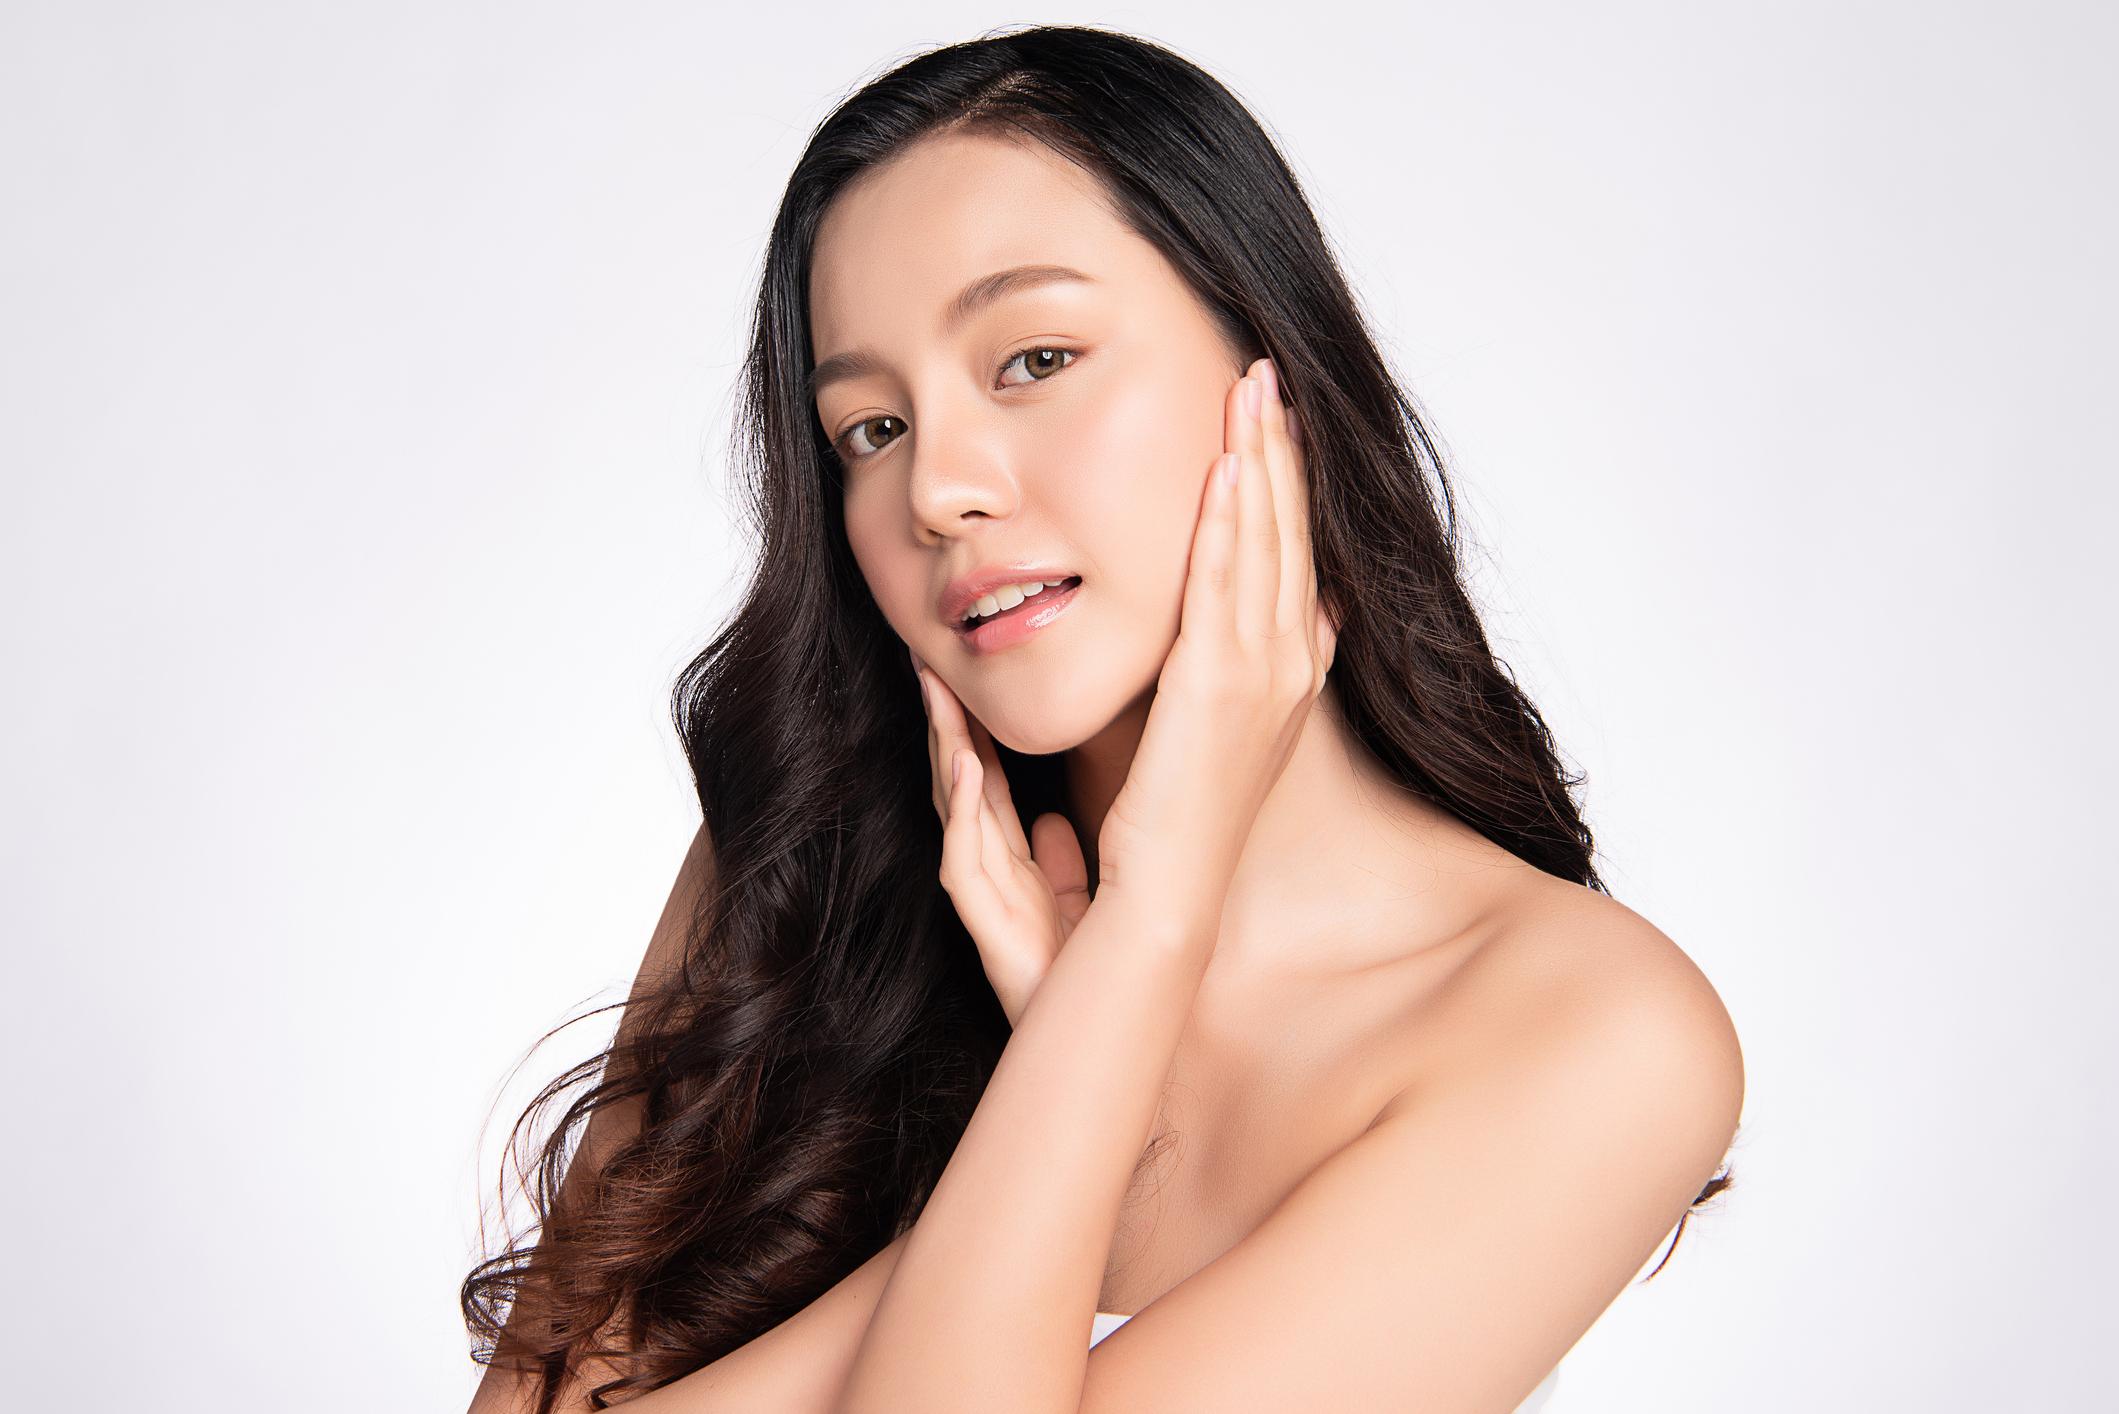 JunoMediSPA Blog | Which Is Better? A Chemical Peel or Laser Skin Rejuvenation?